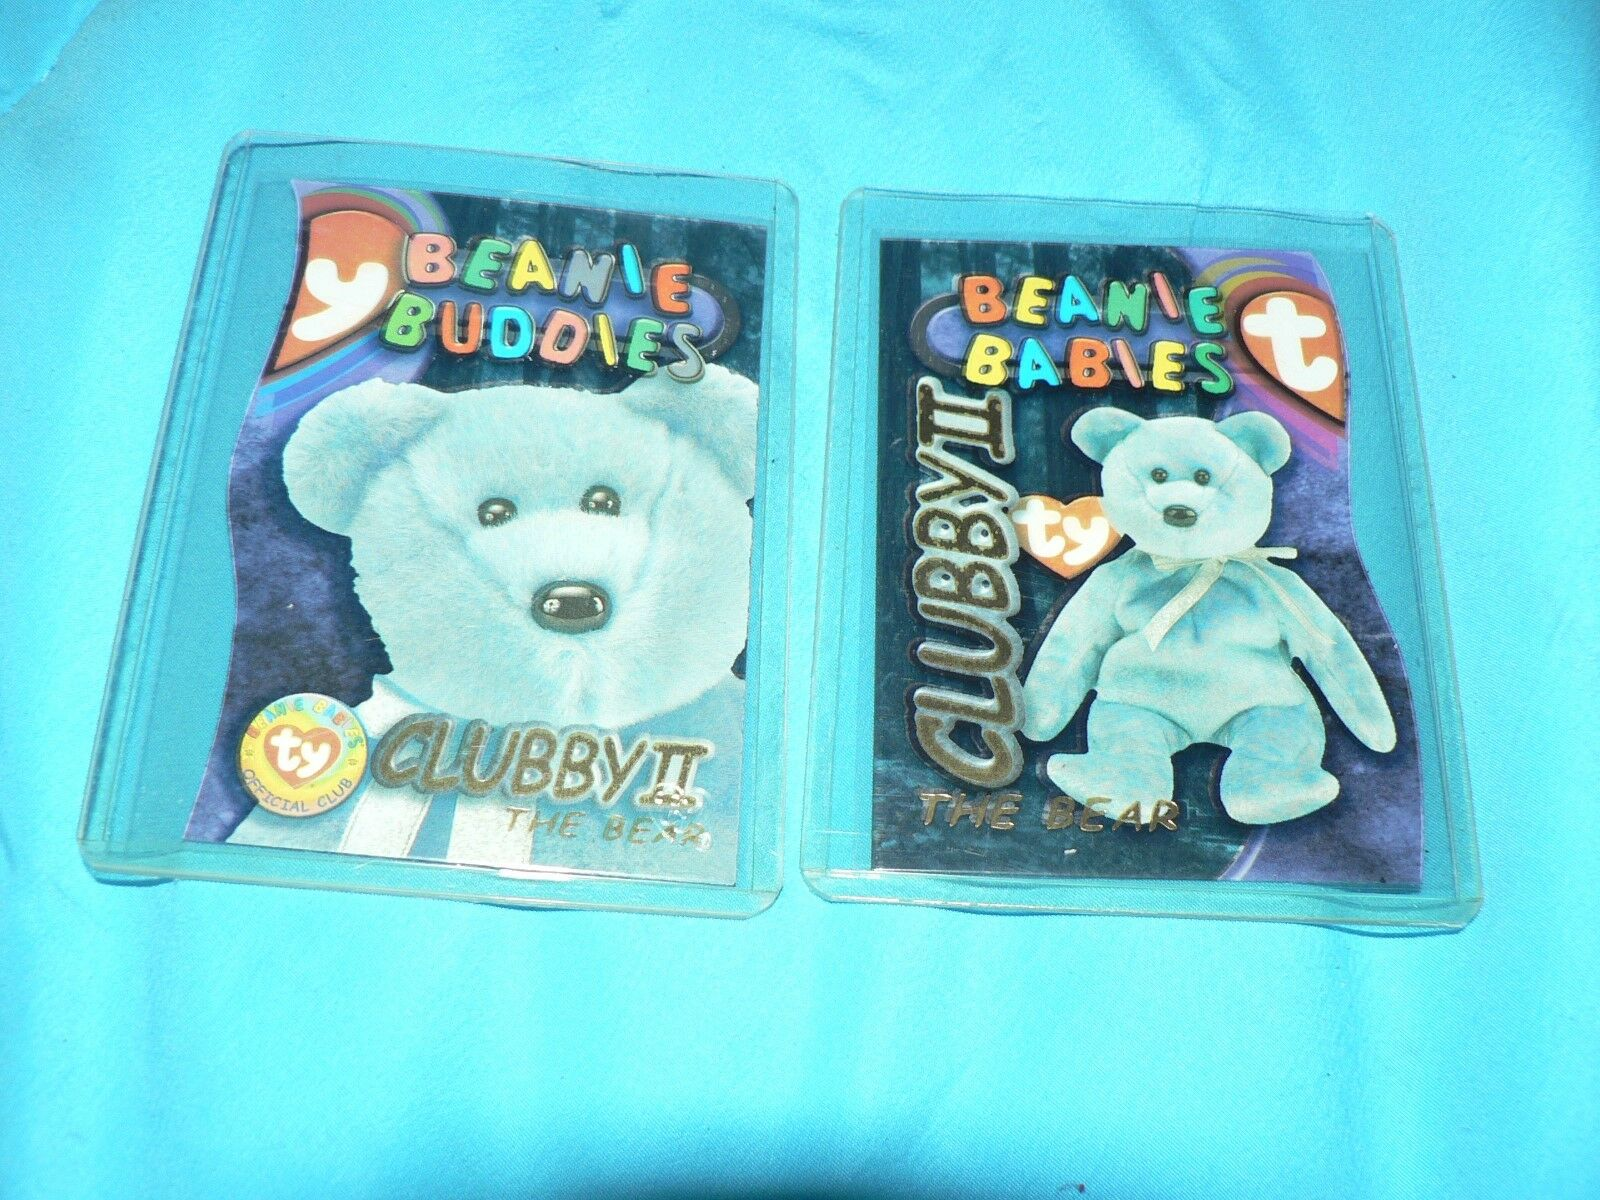 Ty Beanie Babie Babie Babie Buddies 2 Clubby 2 II Cards gold 9991 Limited Edition 2 card Lot d50845